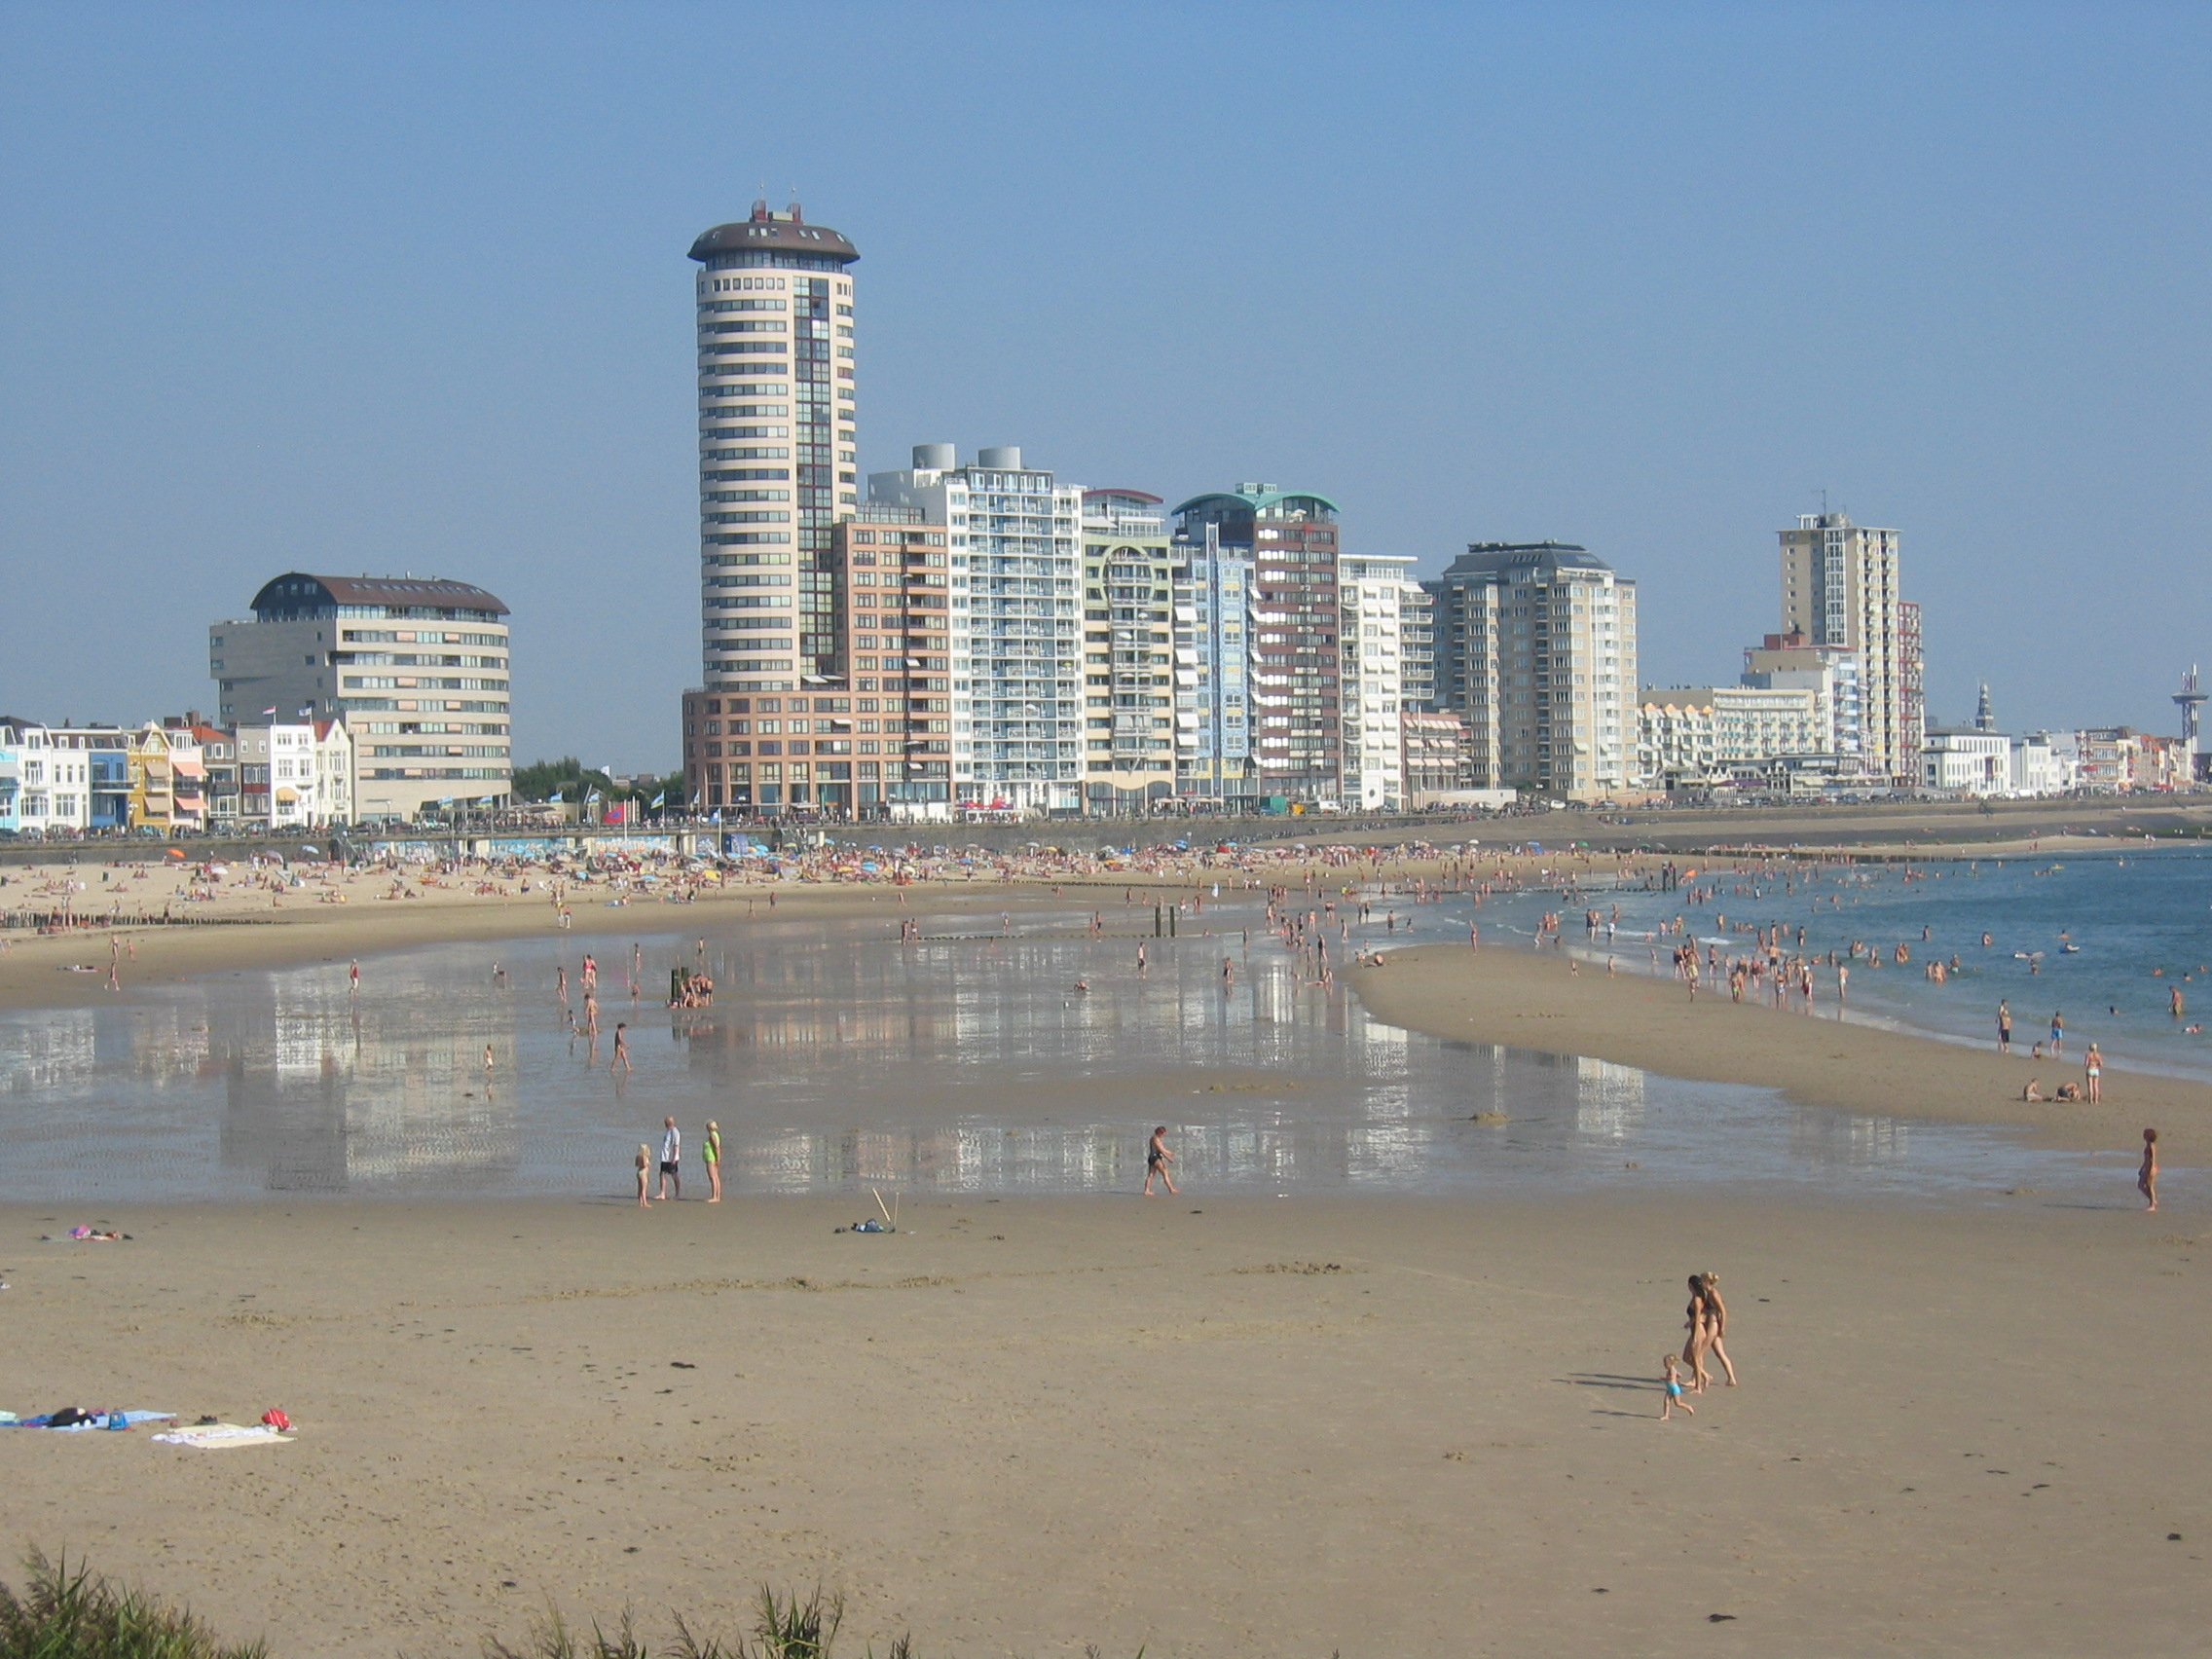 Vlissingen beach